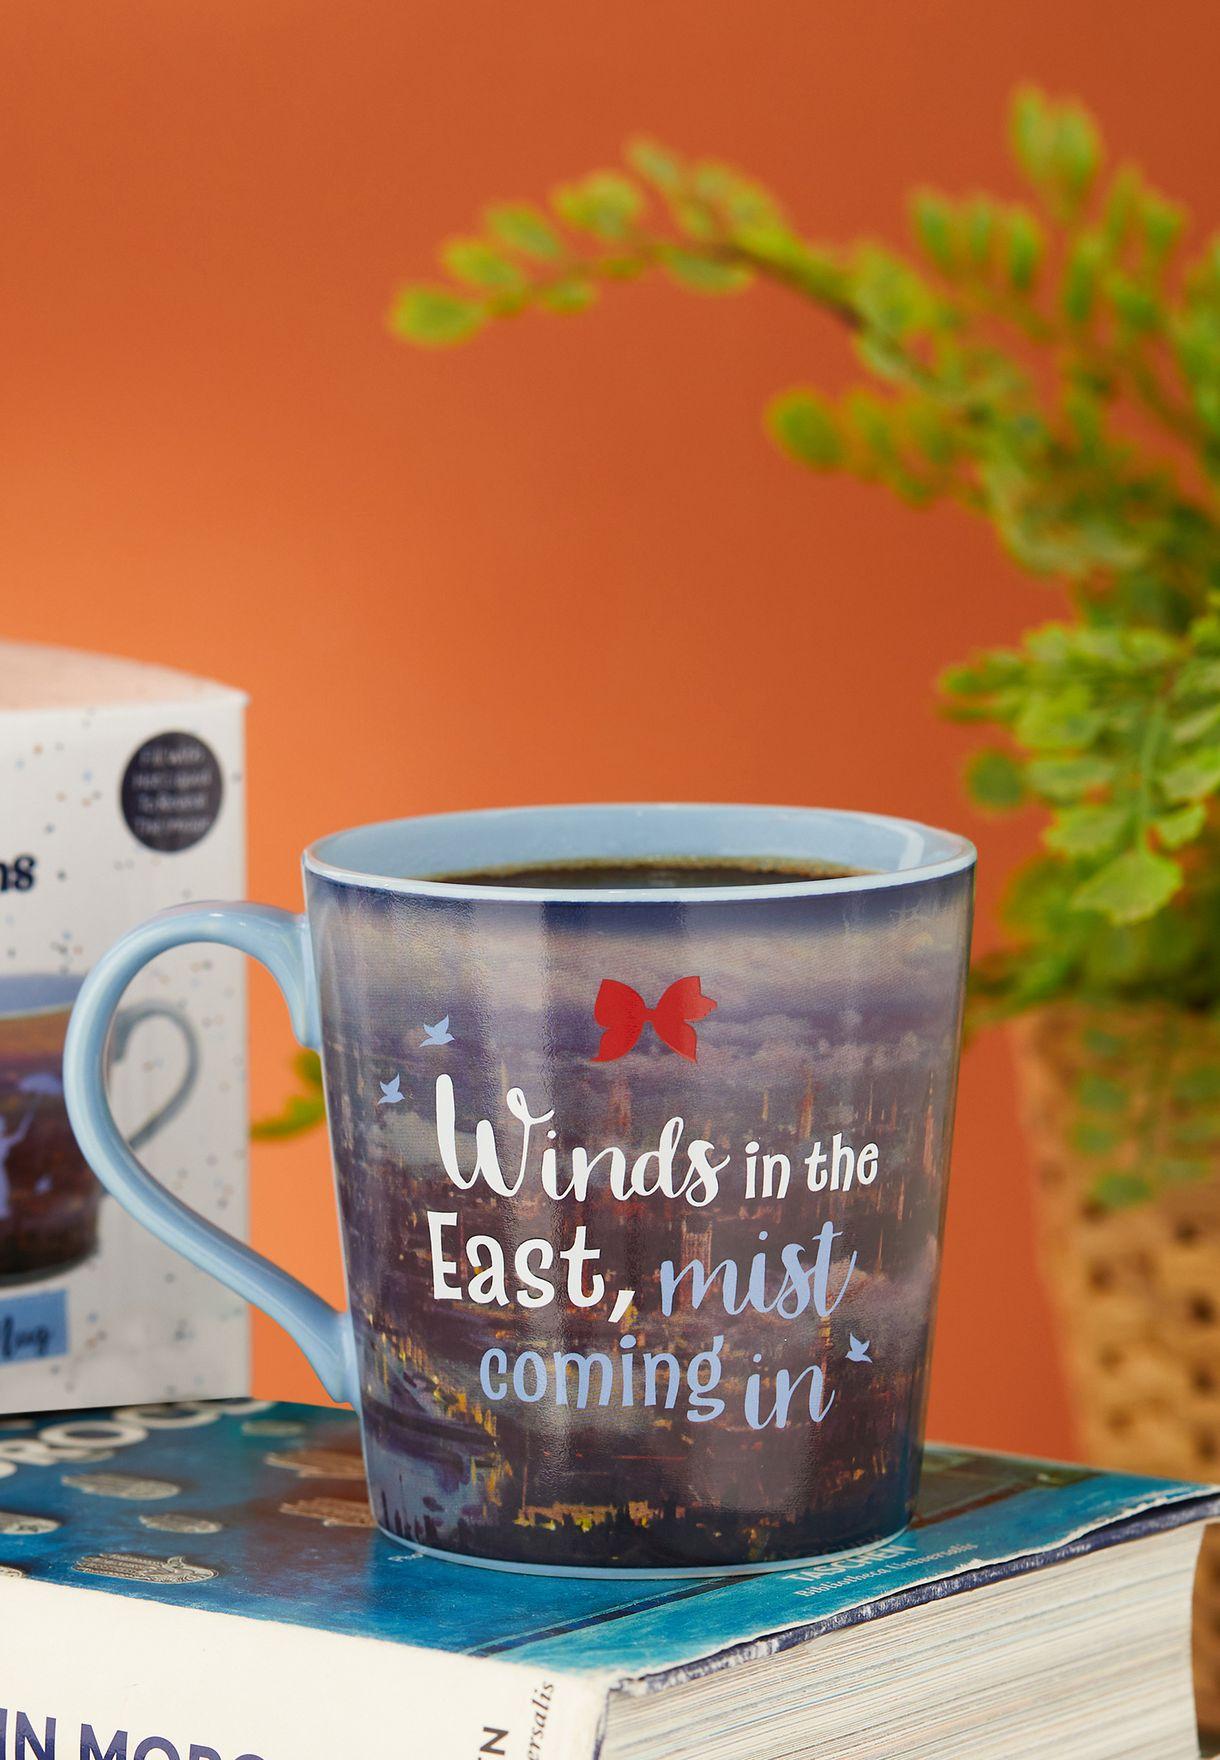 Heat Change Mary Poppins Mug